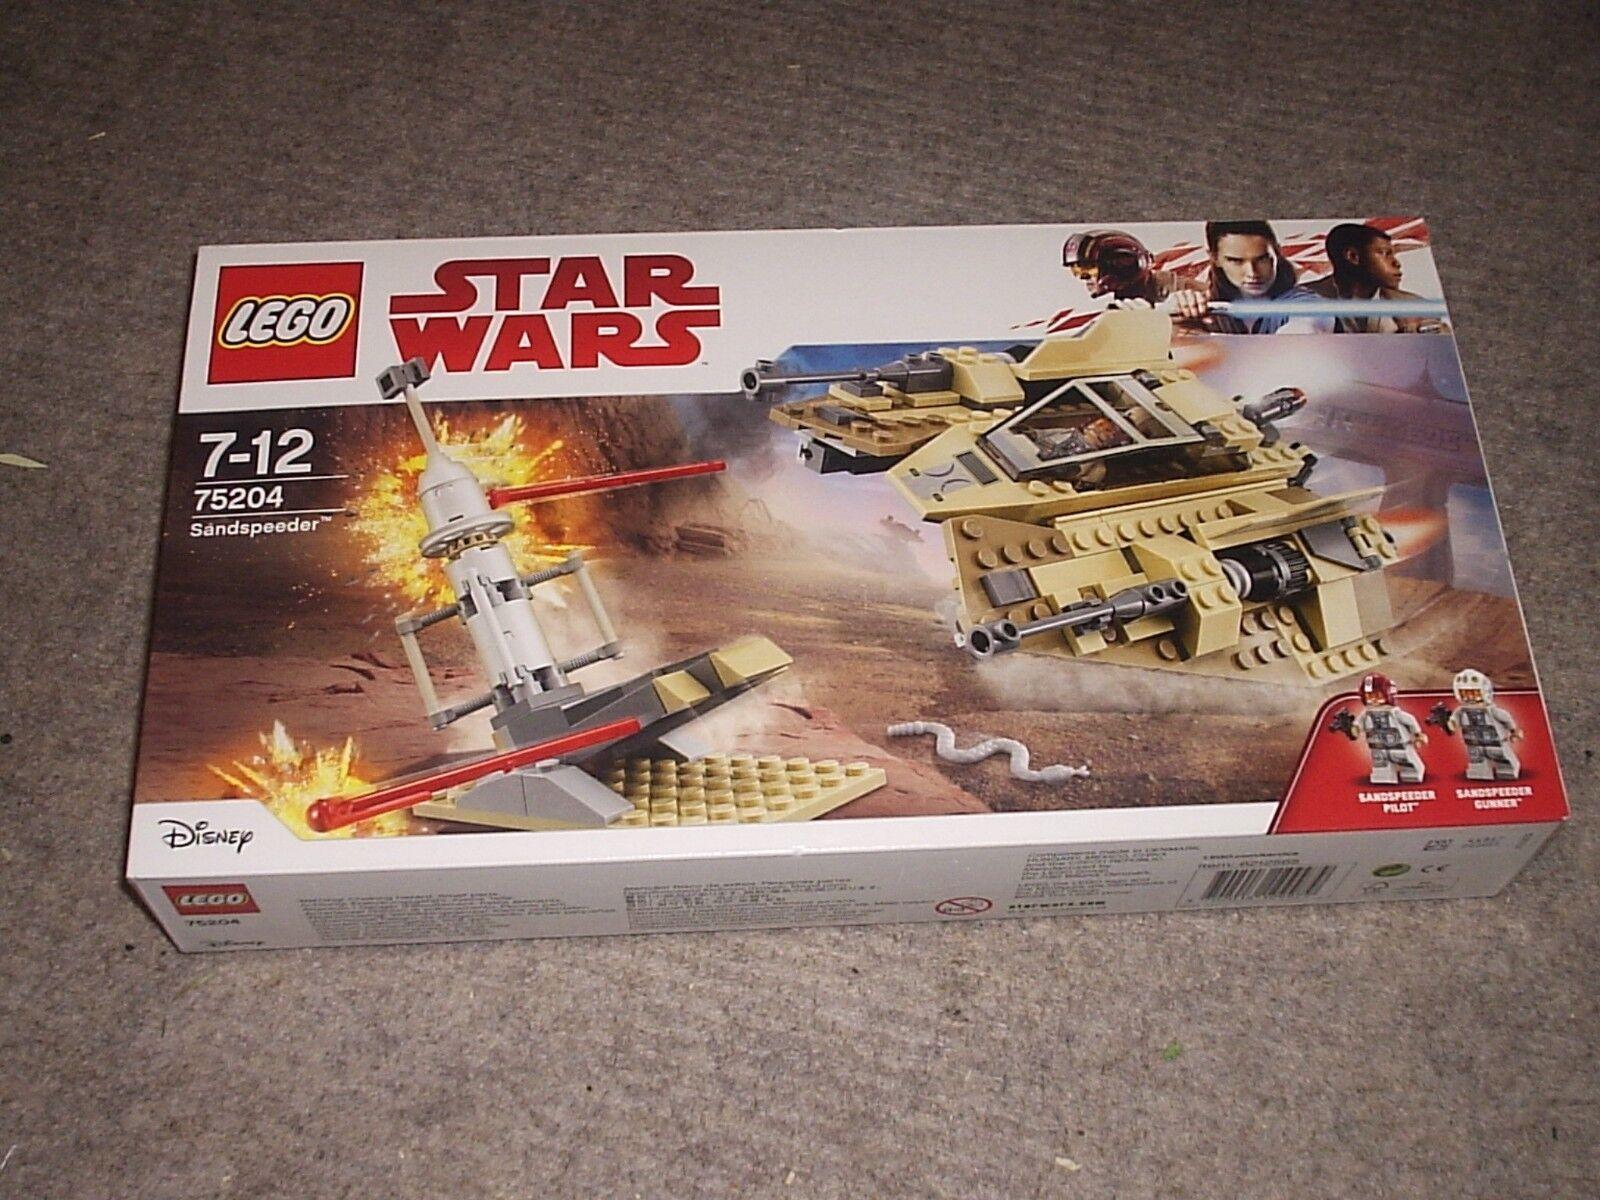 Lego Star Wars Sandspeeder 75204 (new sealed box set)